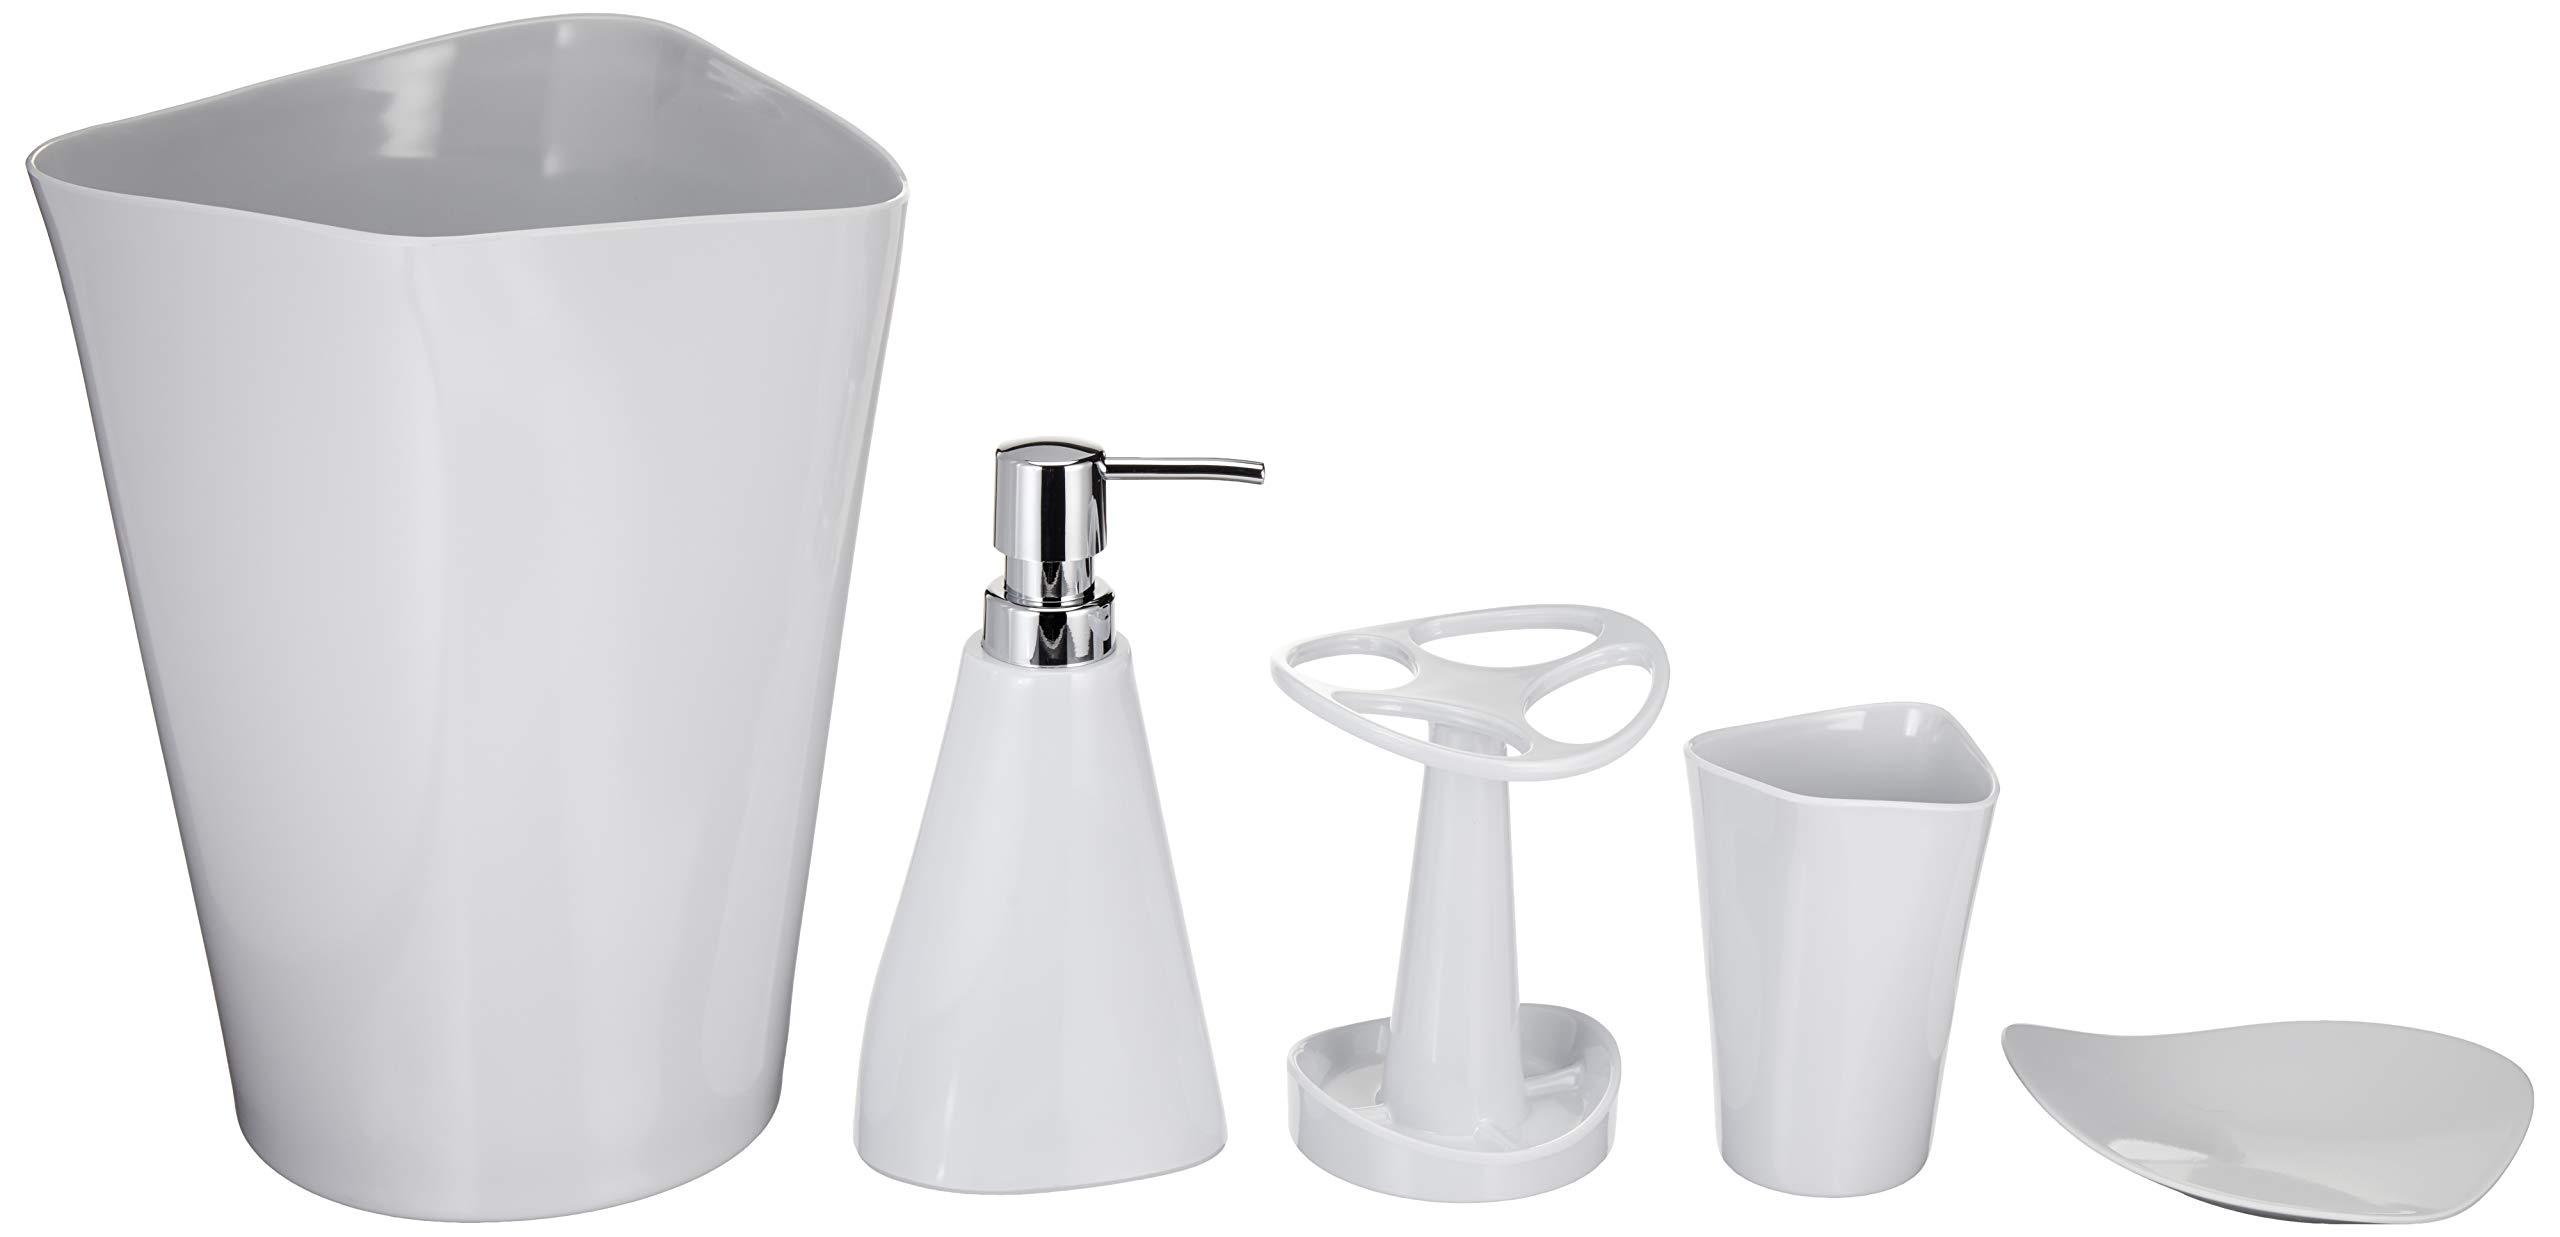 AmazonBasics 5-Piece Bathroom Accessories Set, Smooth White